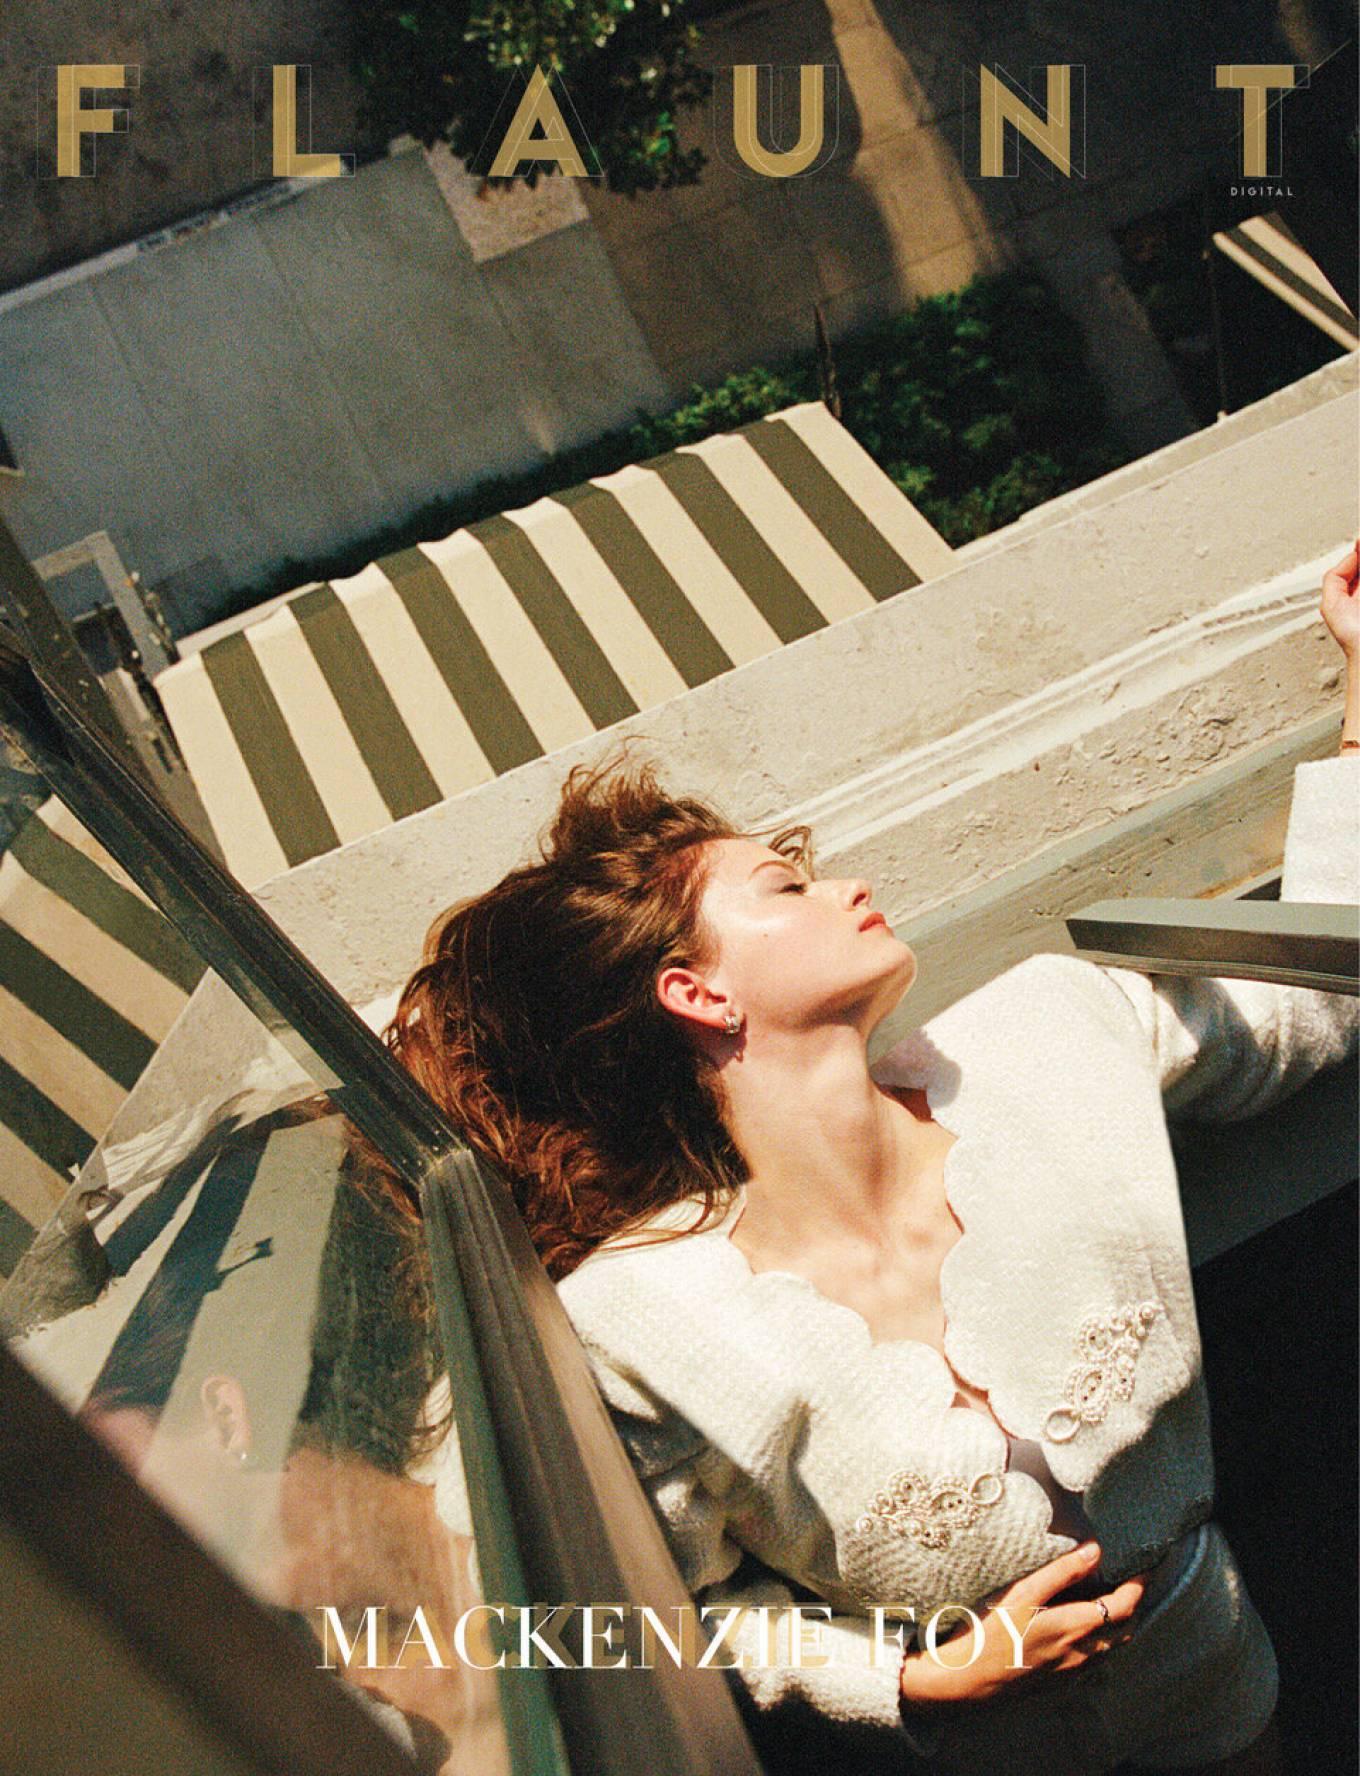 Mackenzie Foy 2020 : Mackenzie Foy – Wearing Chanel in photoshoot for Flaunt Magazine-03